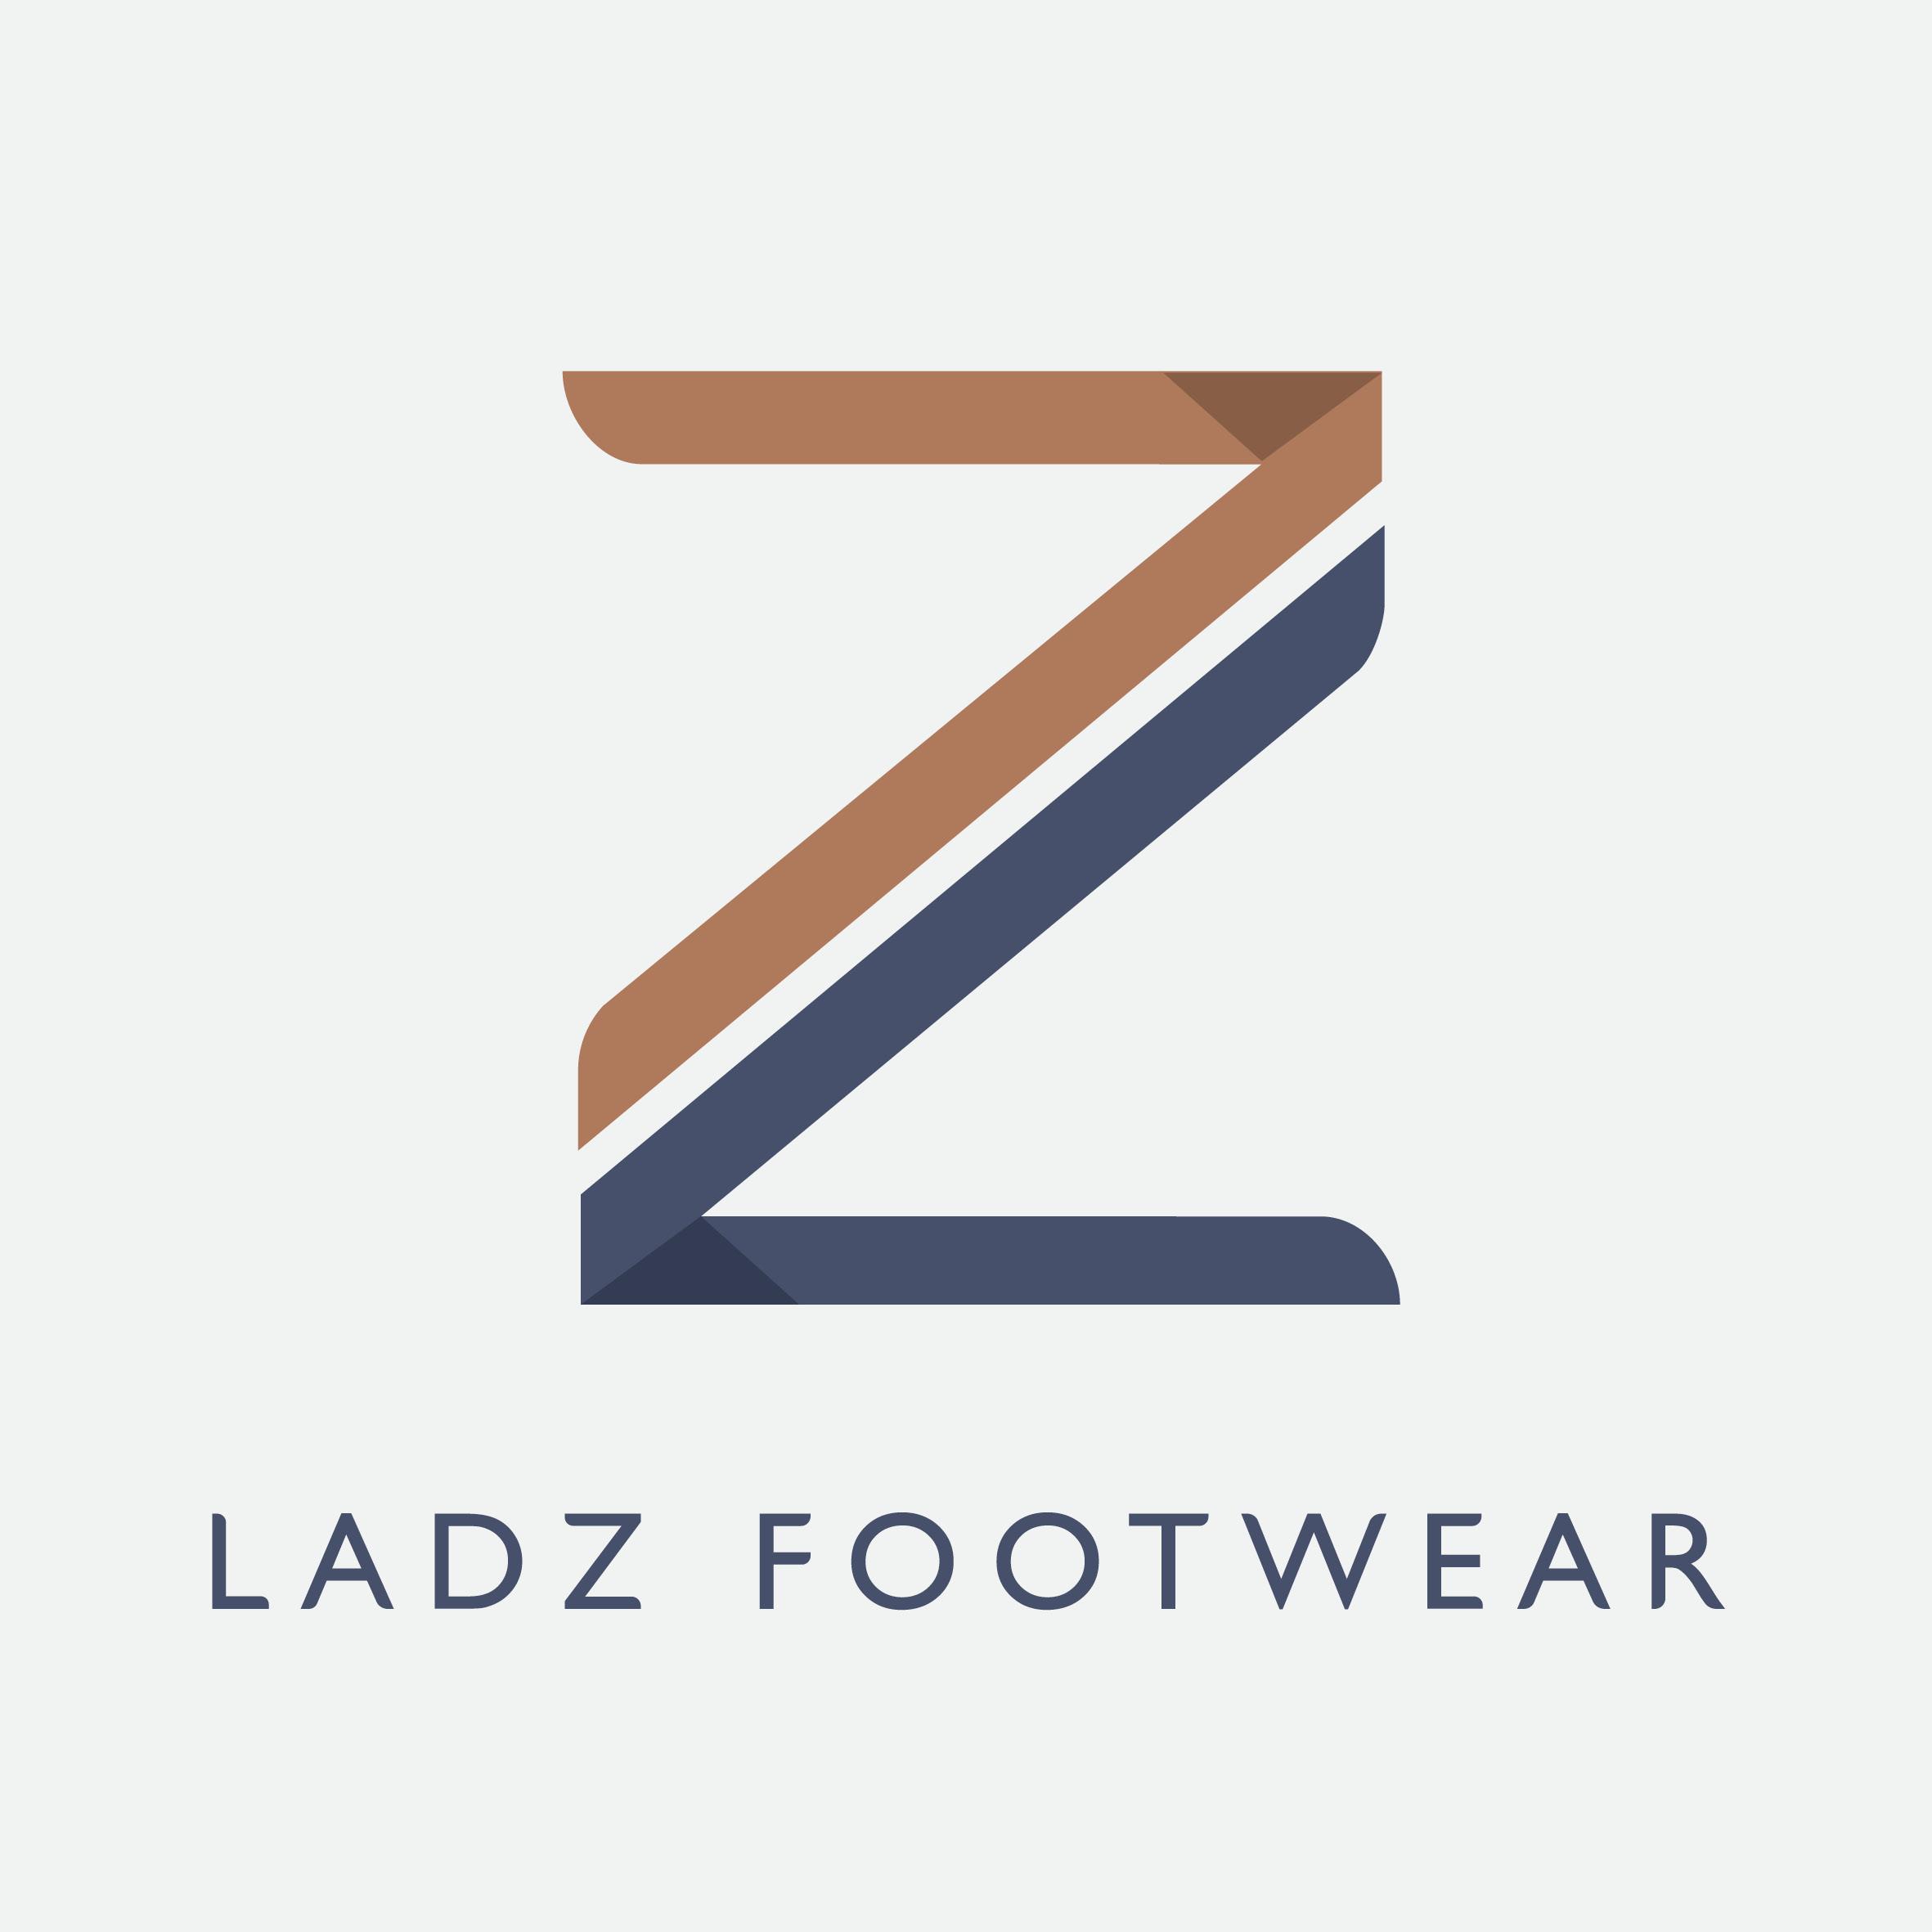 LadzFootwear-Social-Profile.jpg